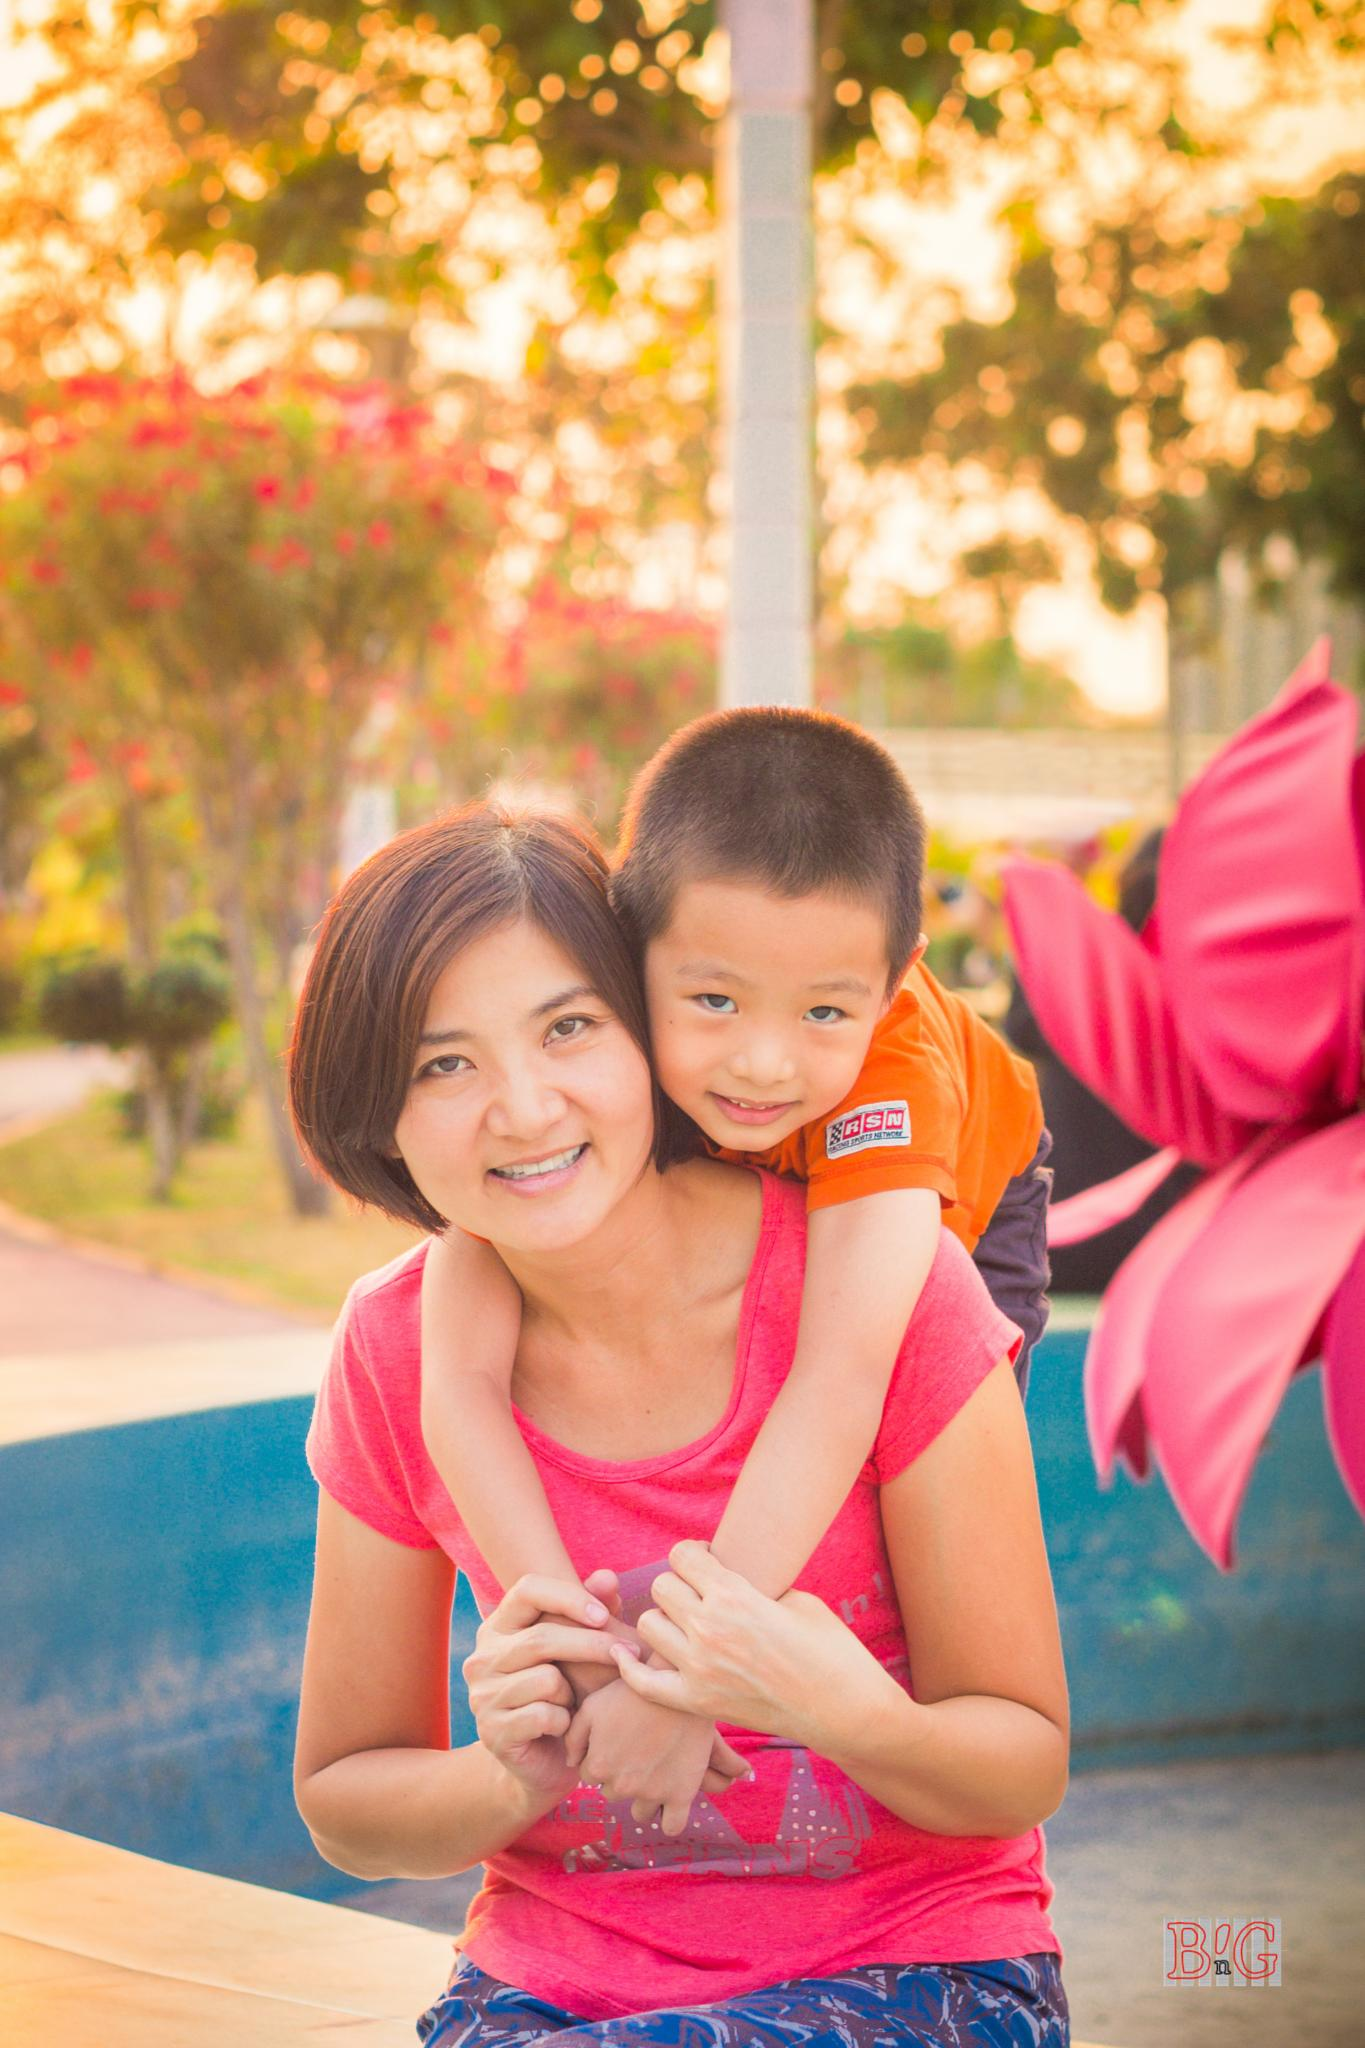 Boy Junior and her mom by jennymissu